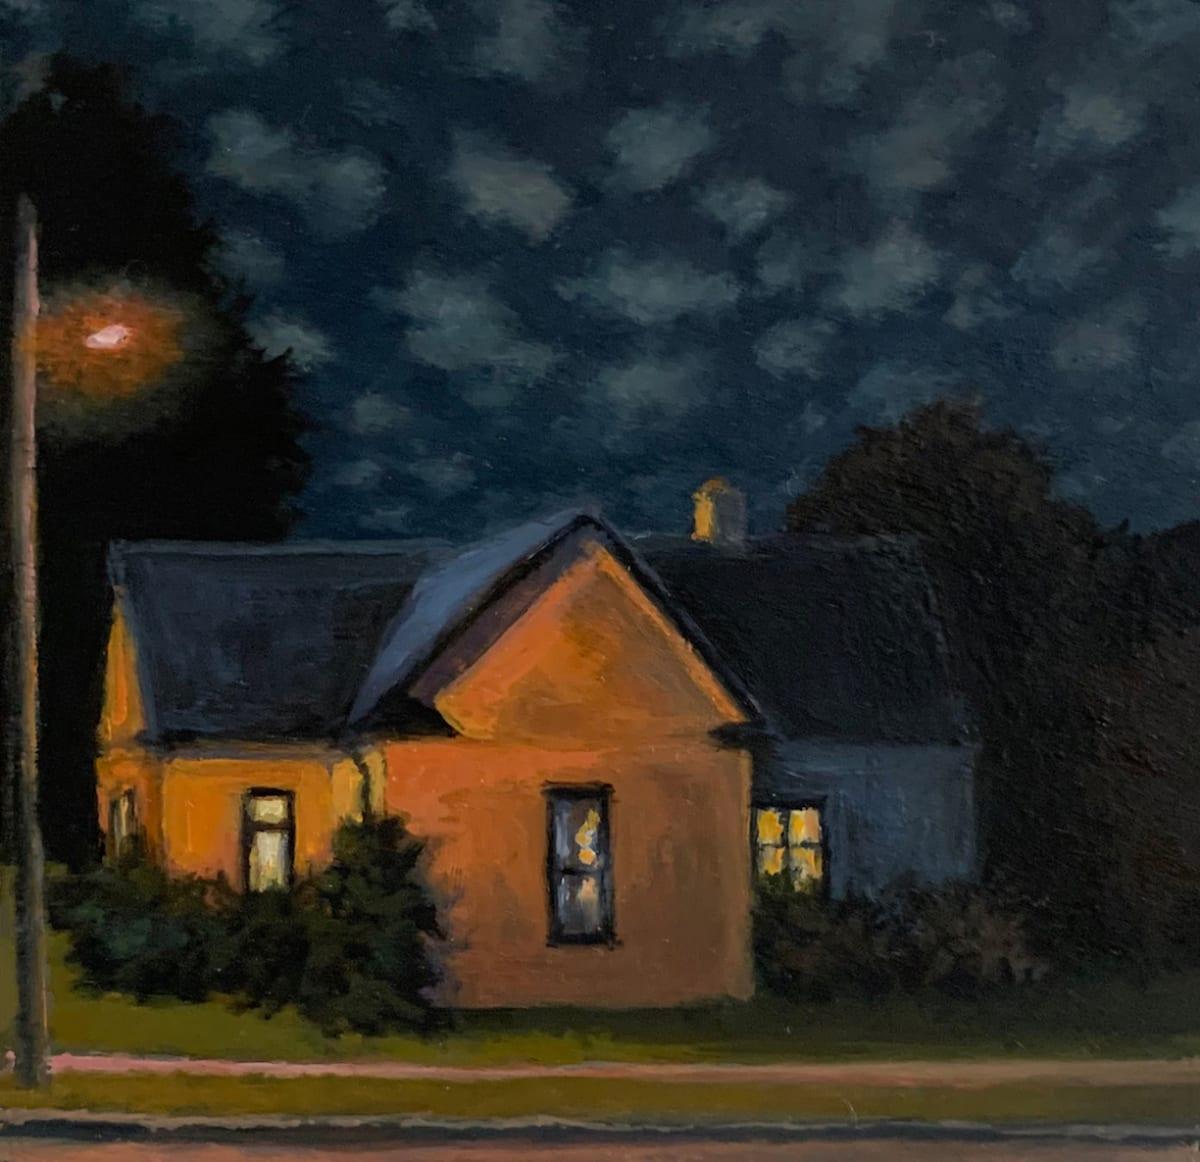 Sally Maca, Altocumulus at Night, 2019